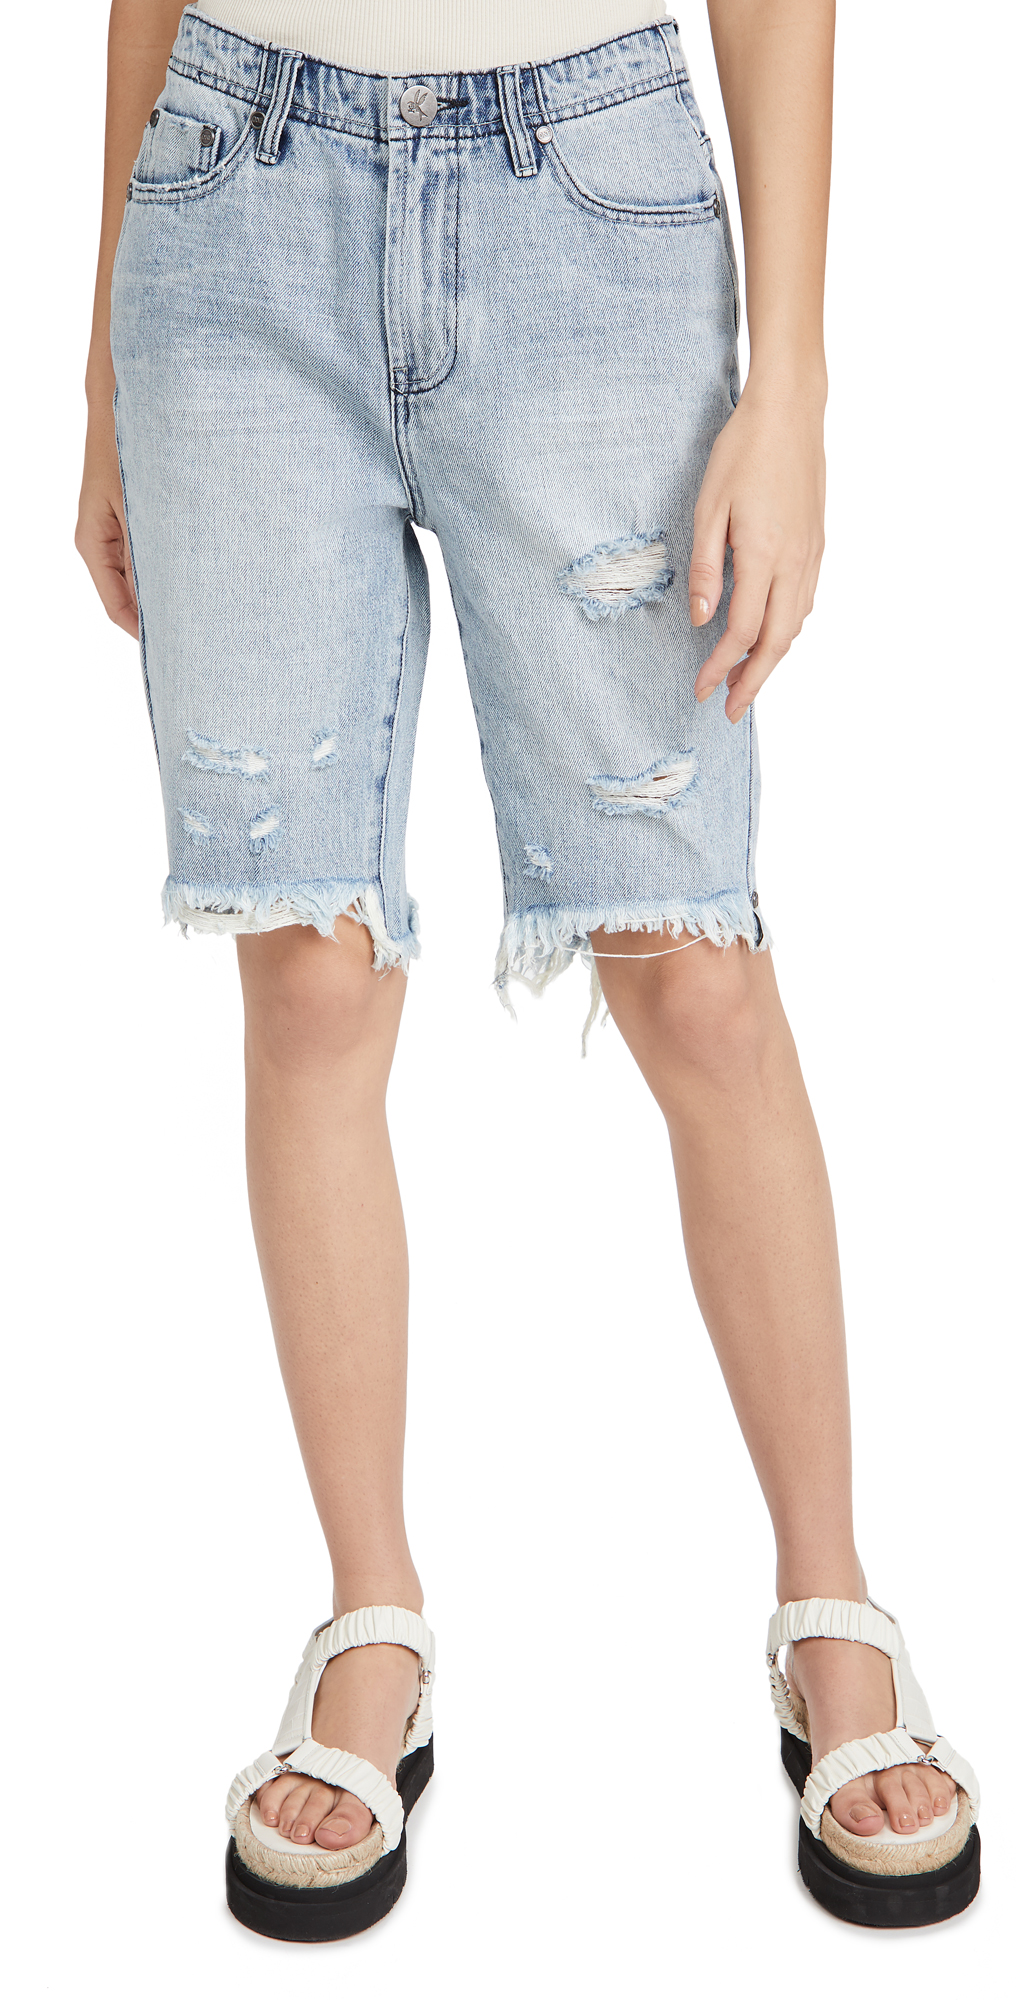 One Teaspoon Salty Dog Cutoff Trucker Shorts